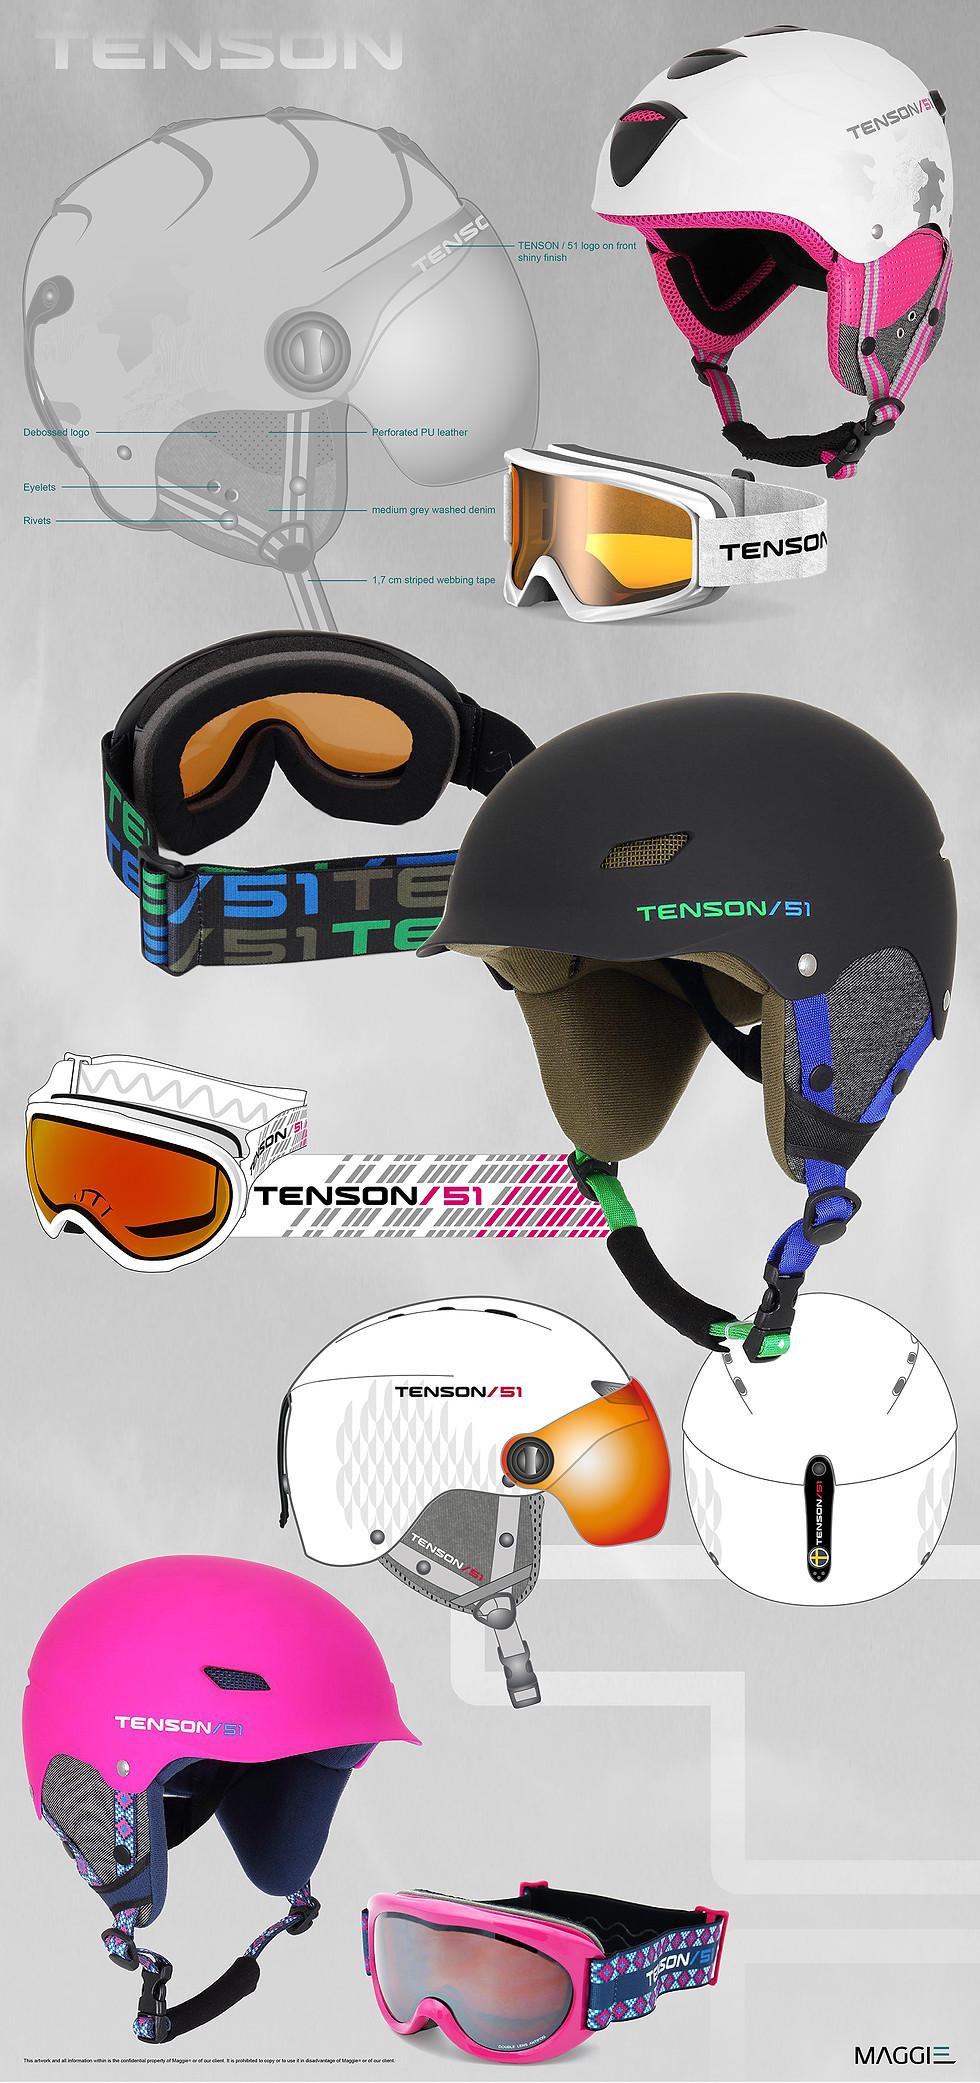 Tenson2018-helmets-s.jpg